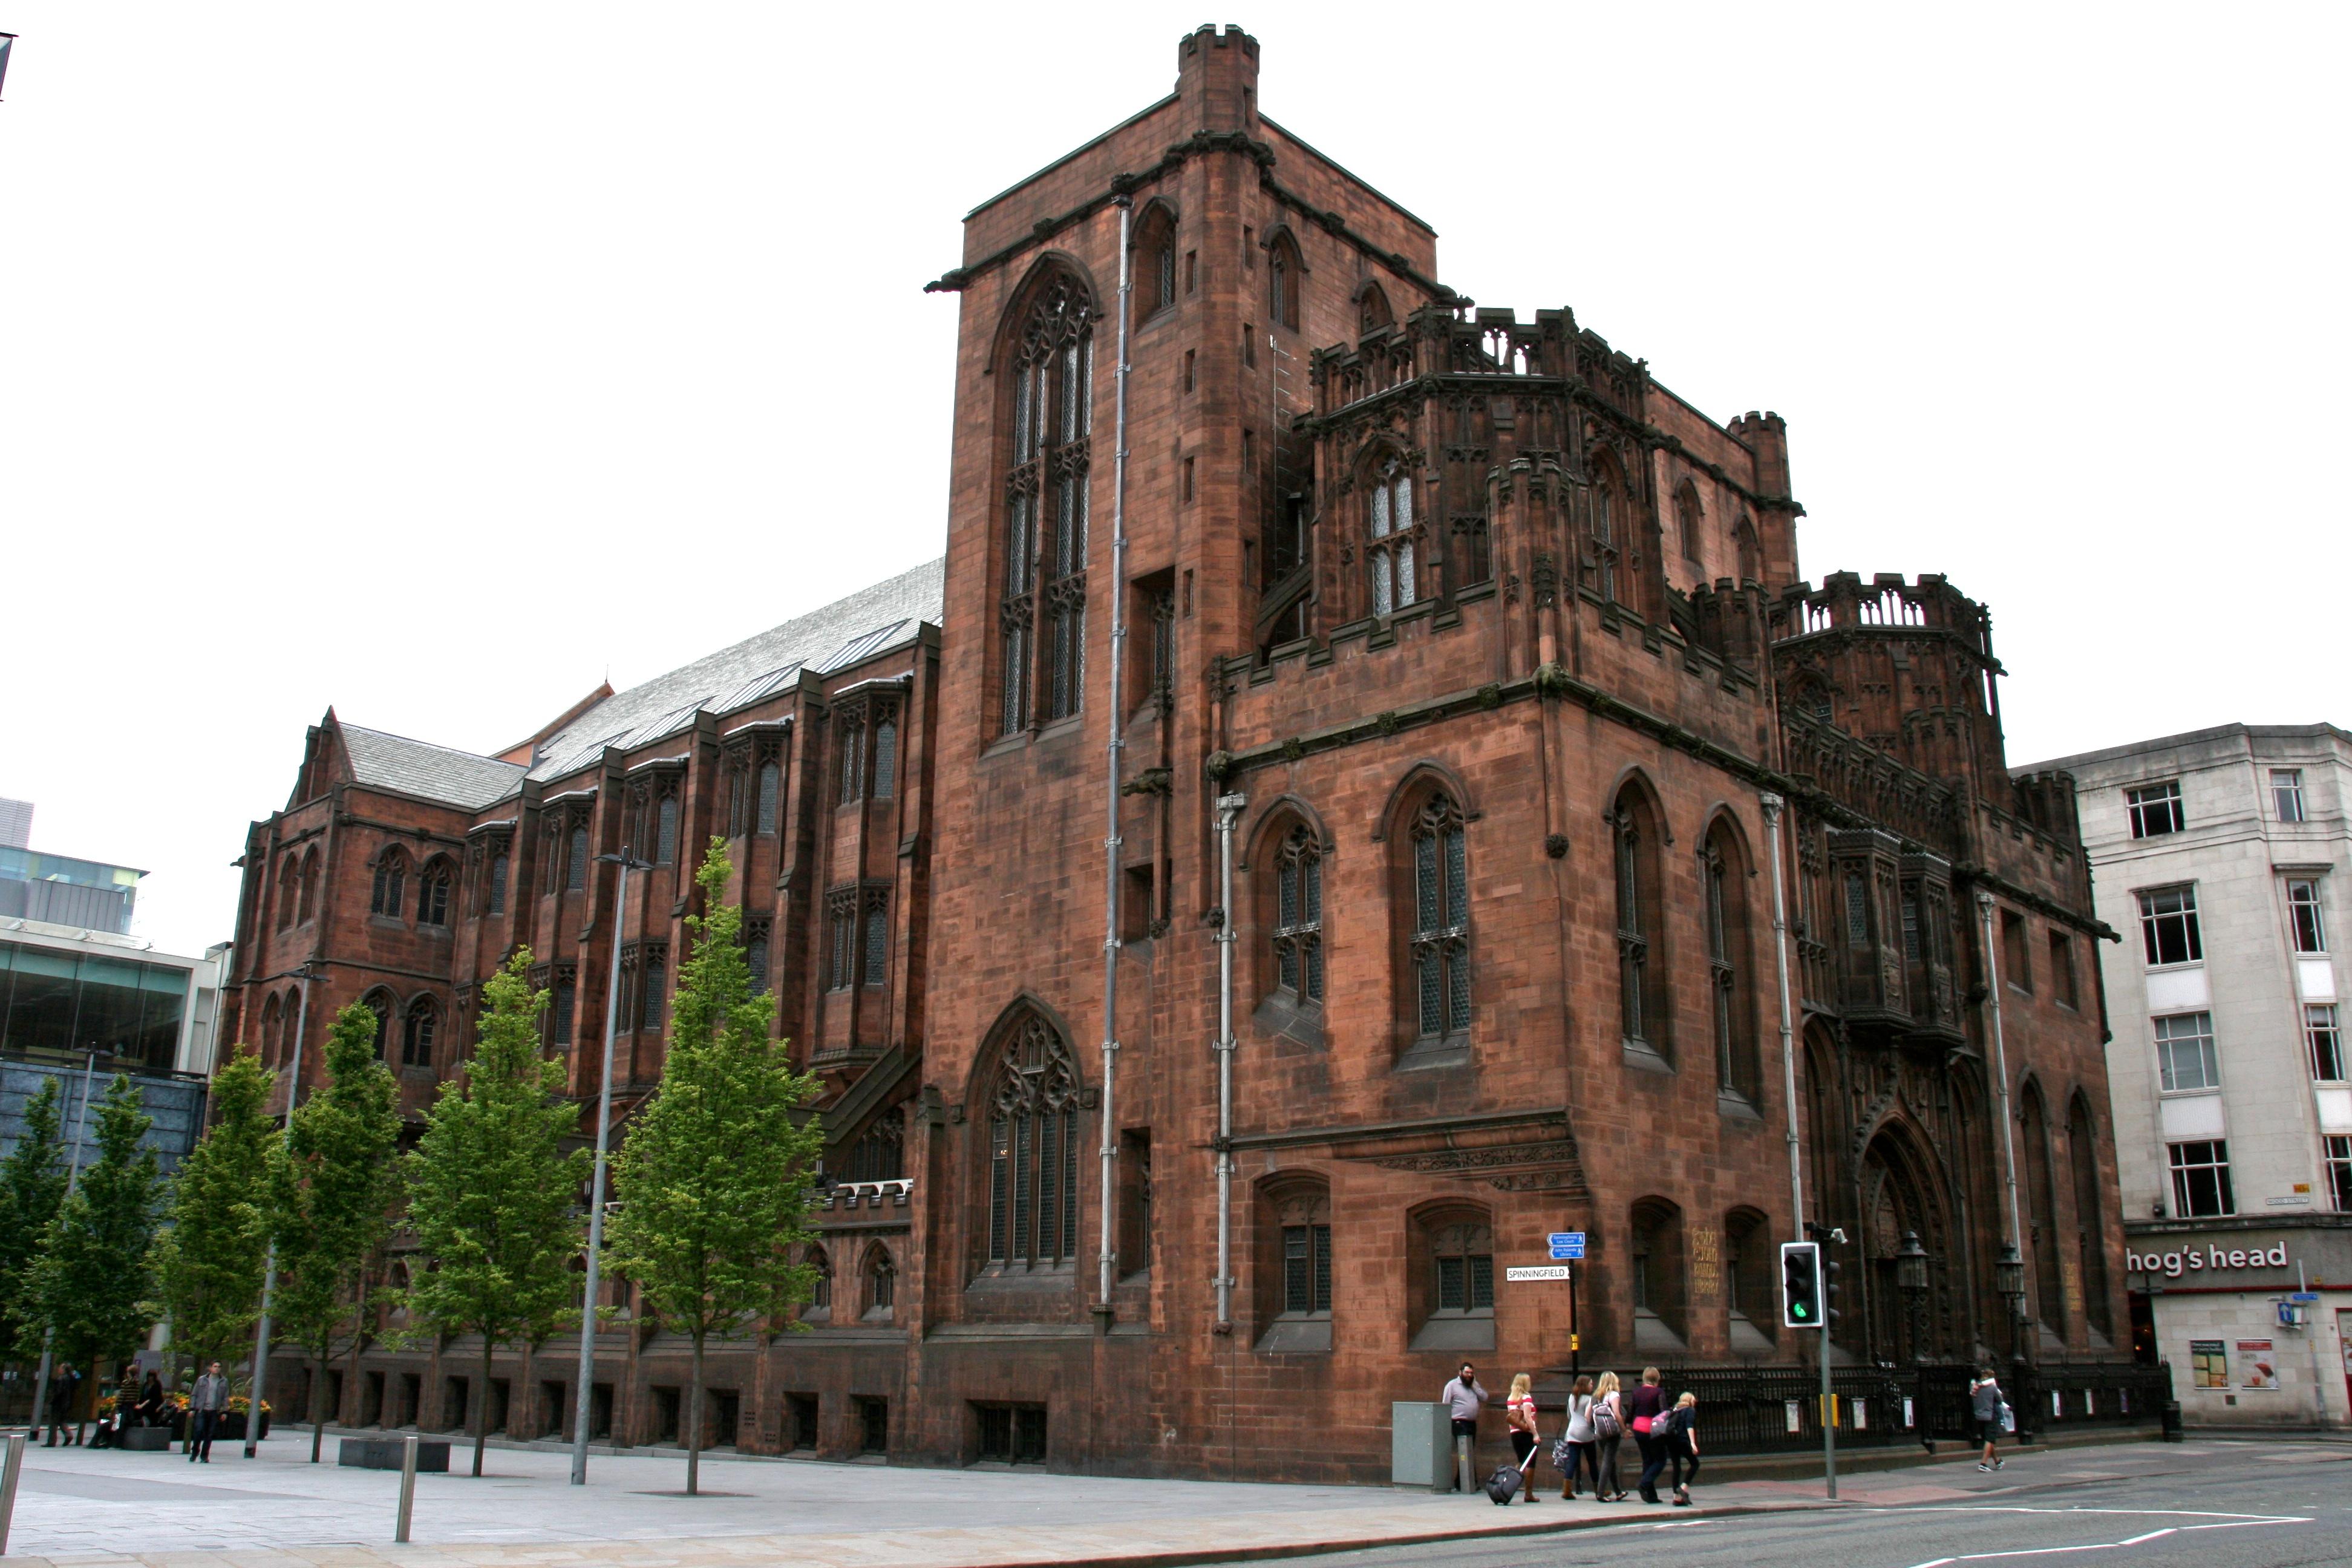 John Rylands Library v Manchesteru v Anglii.